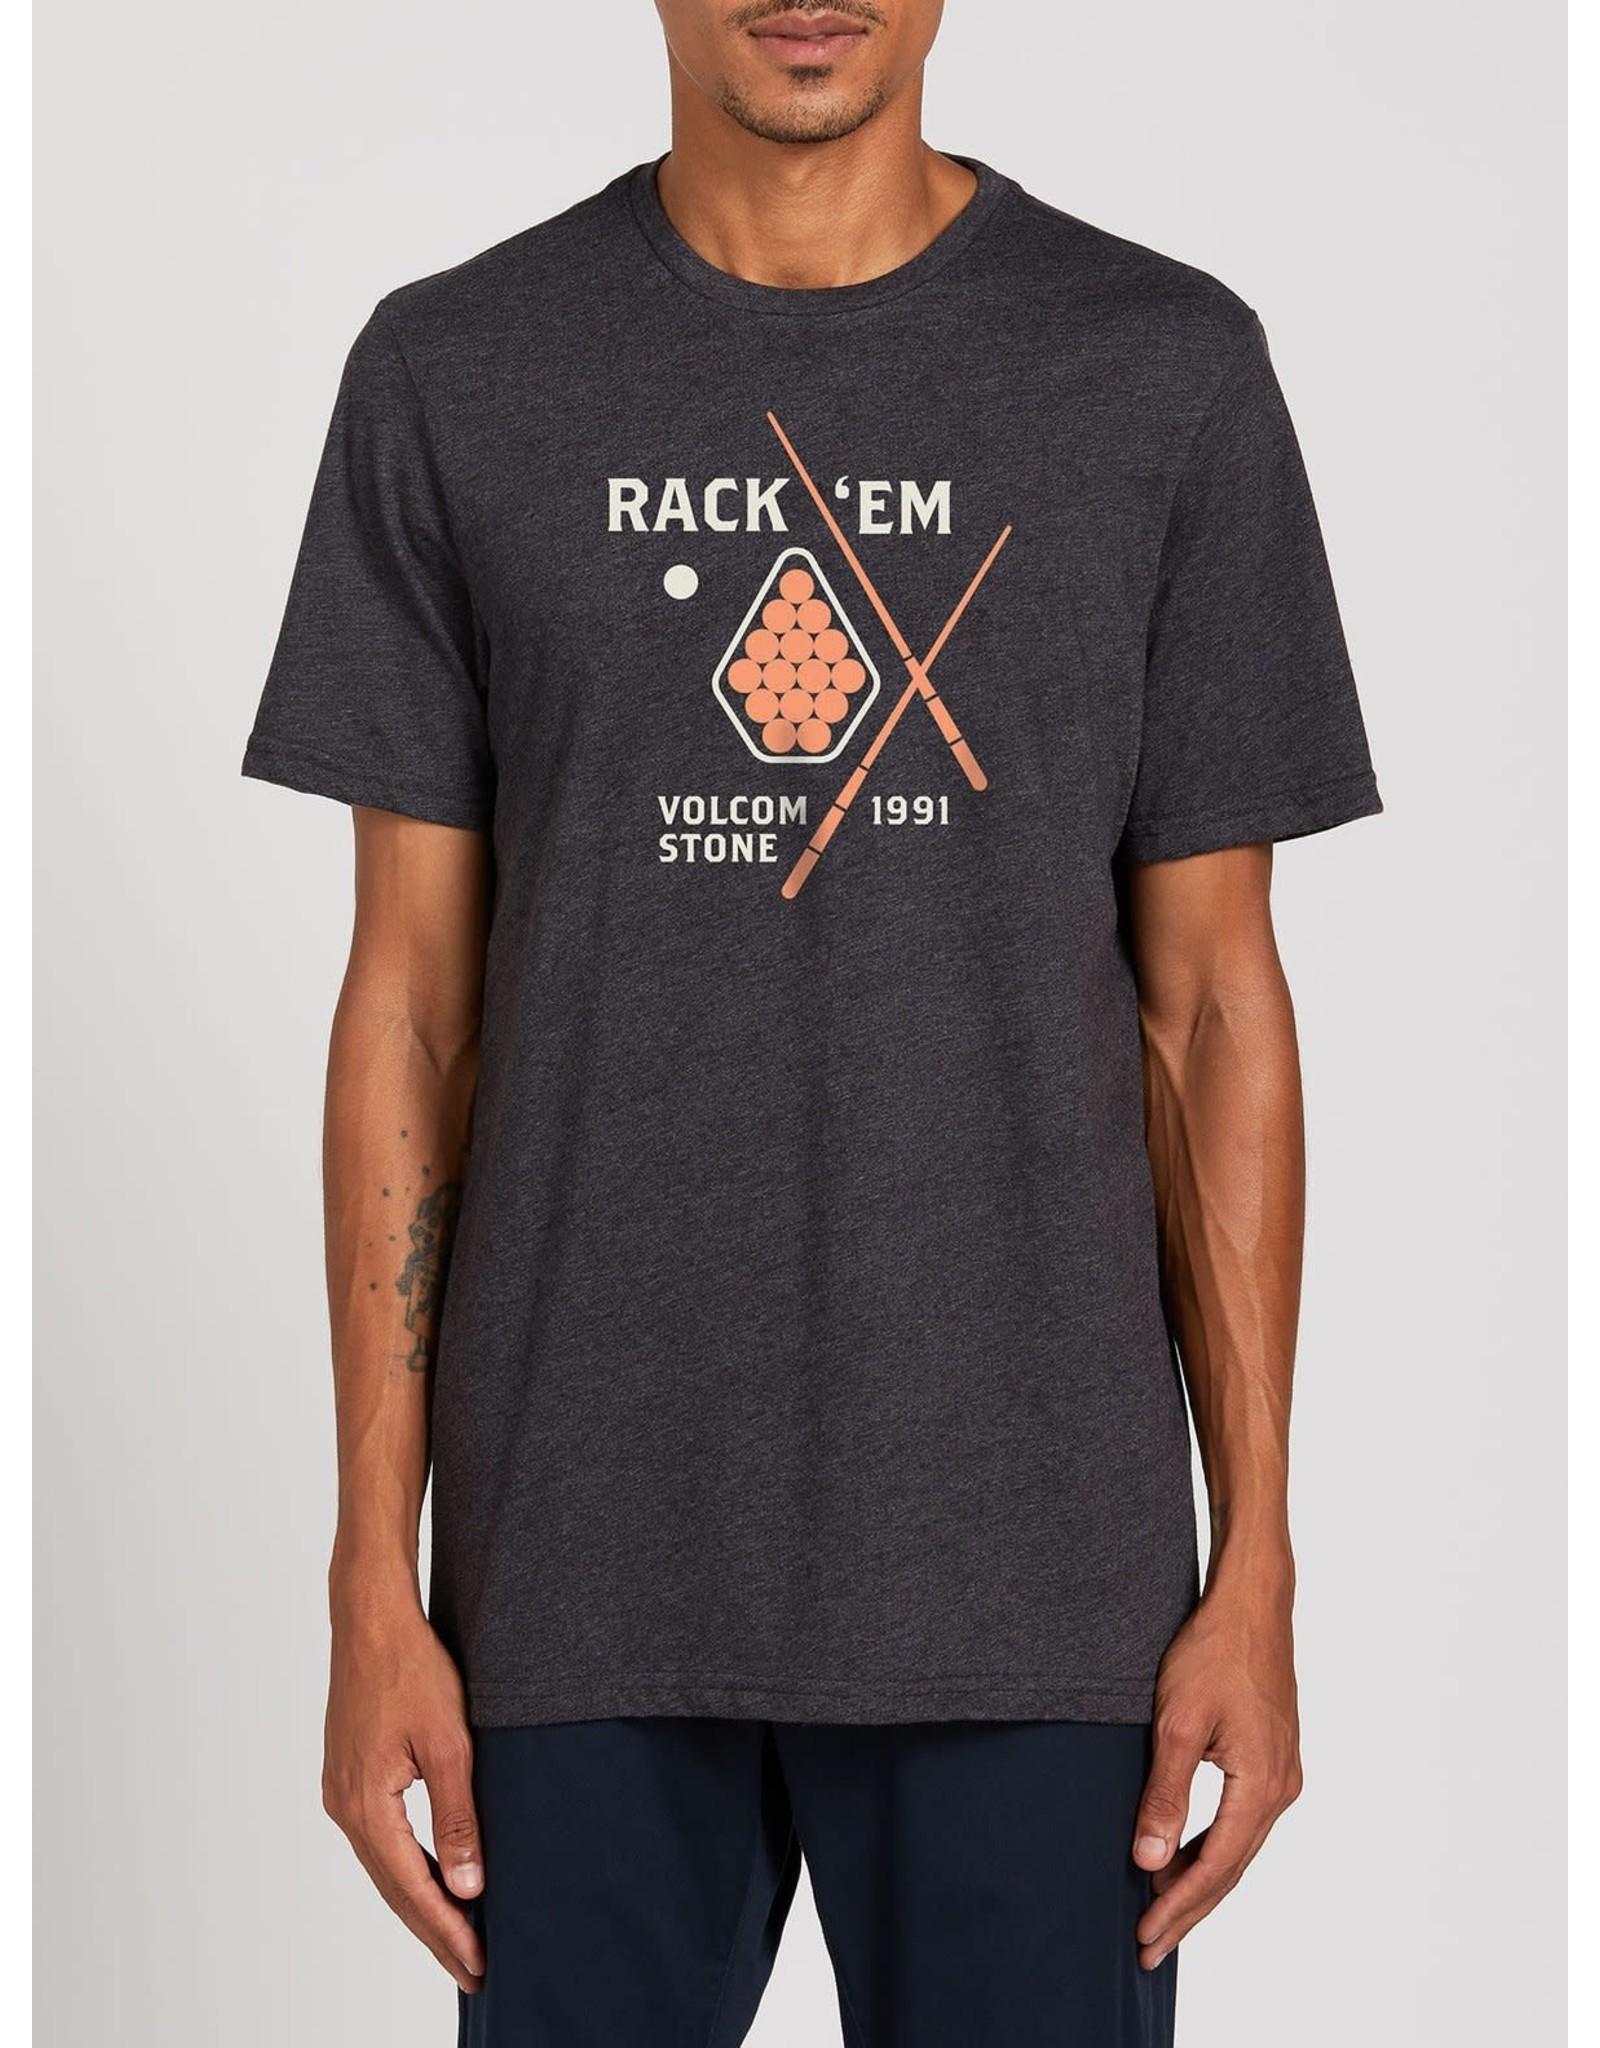 VOLCOM Men's Rack Ball S/S Tee